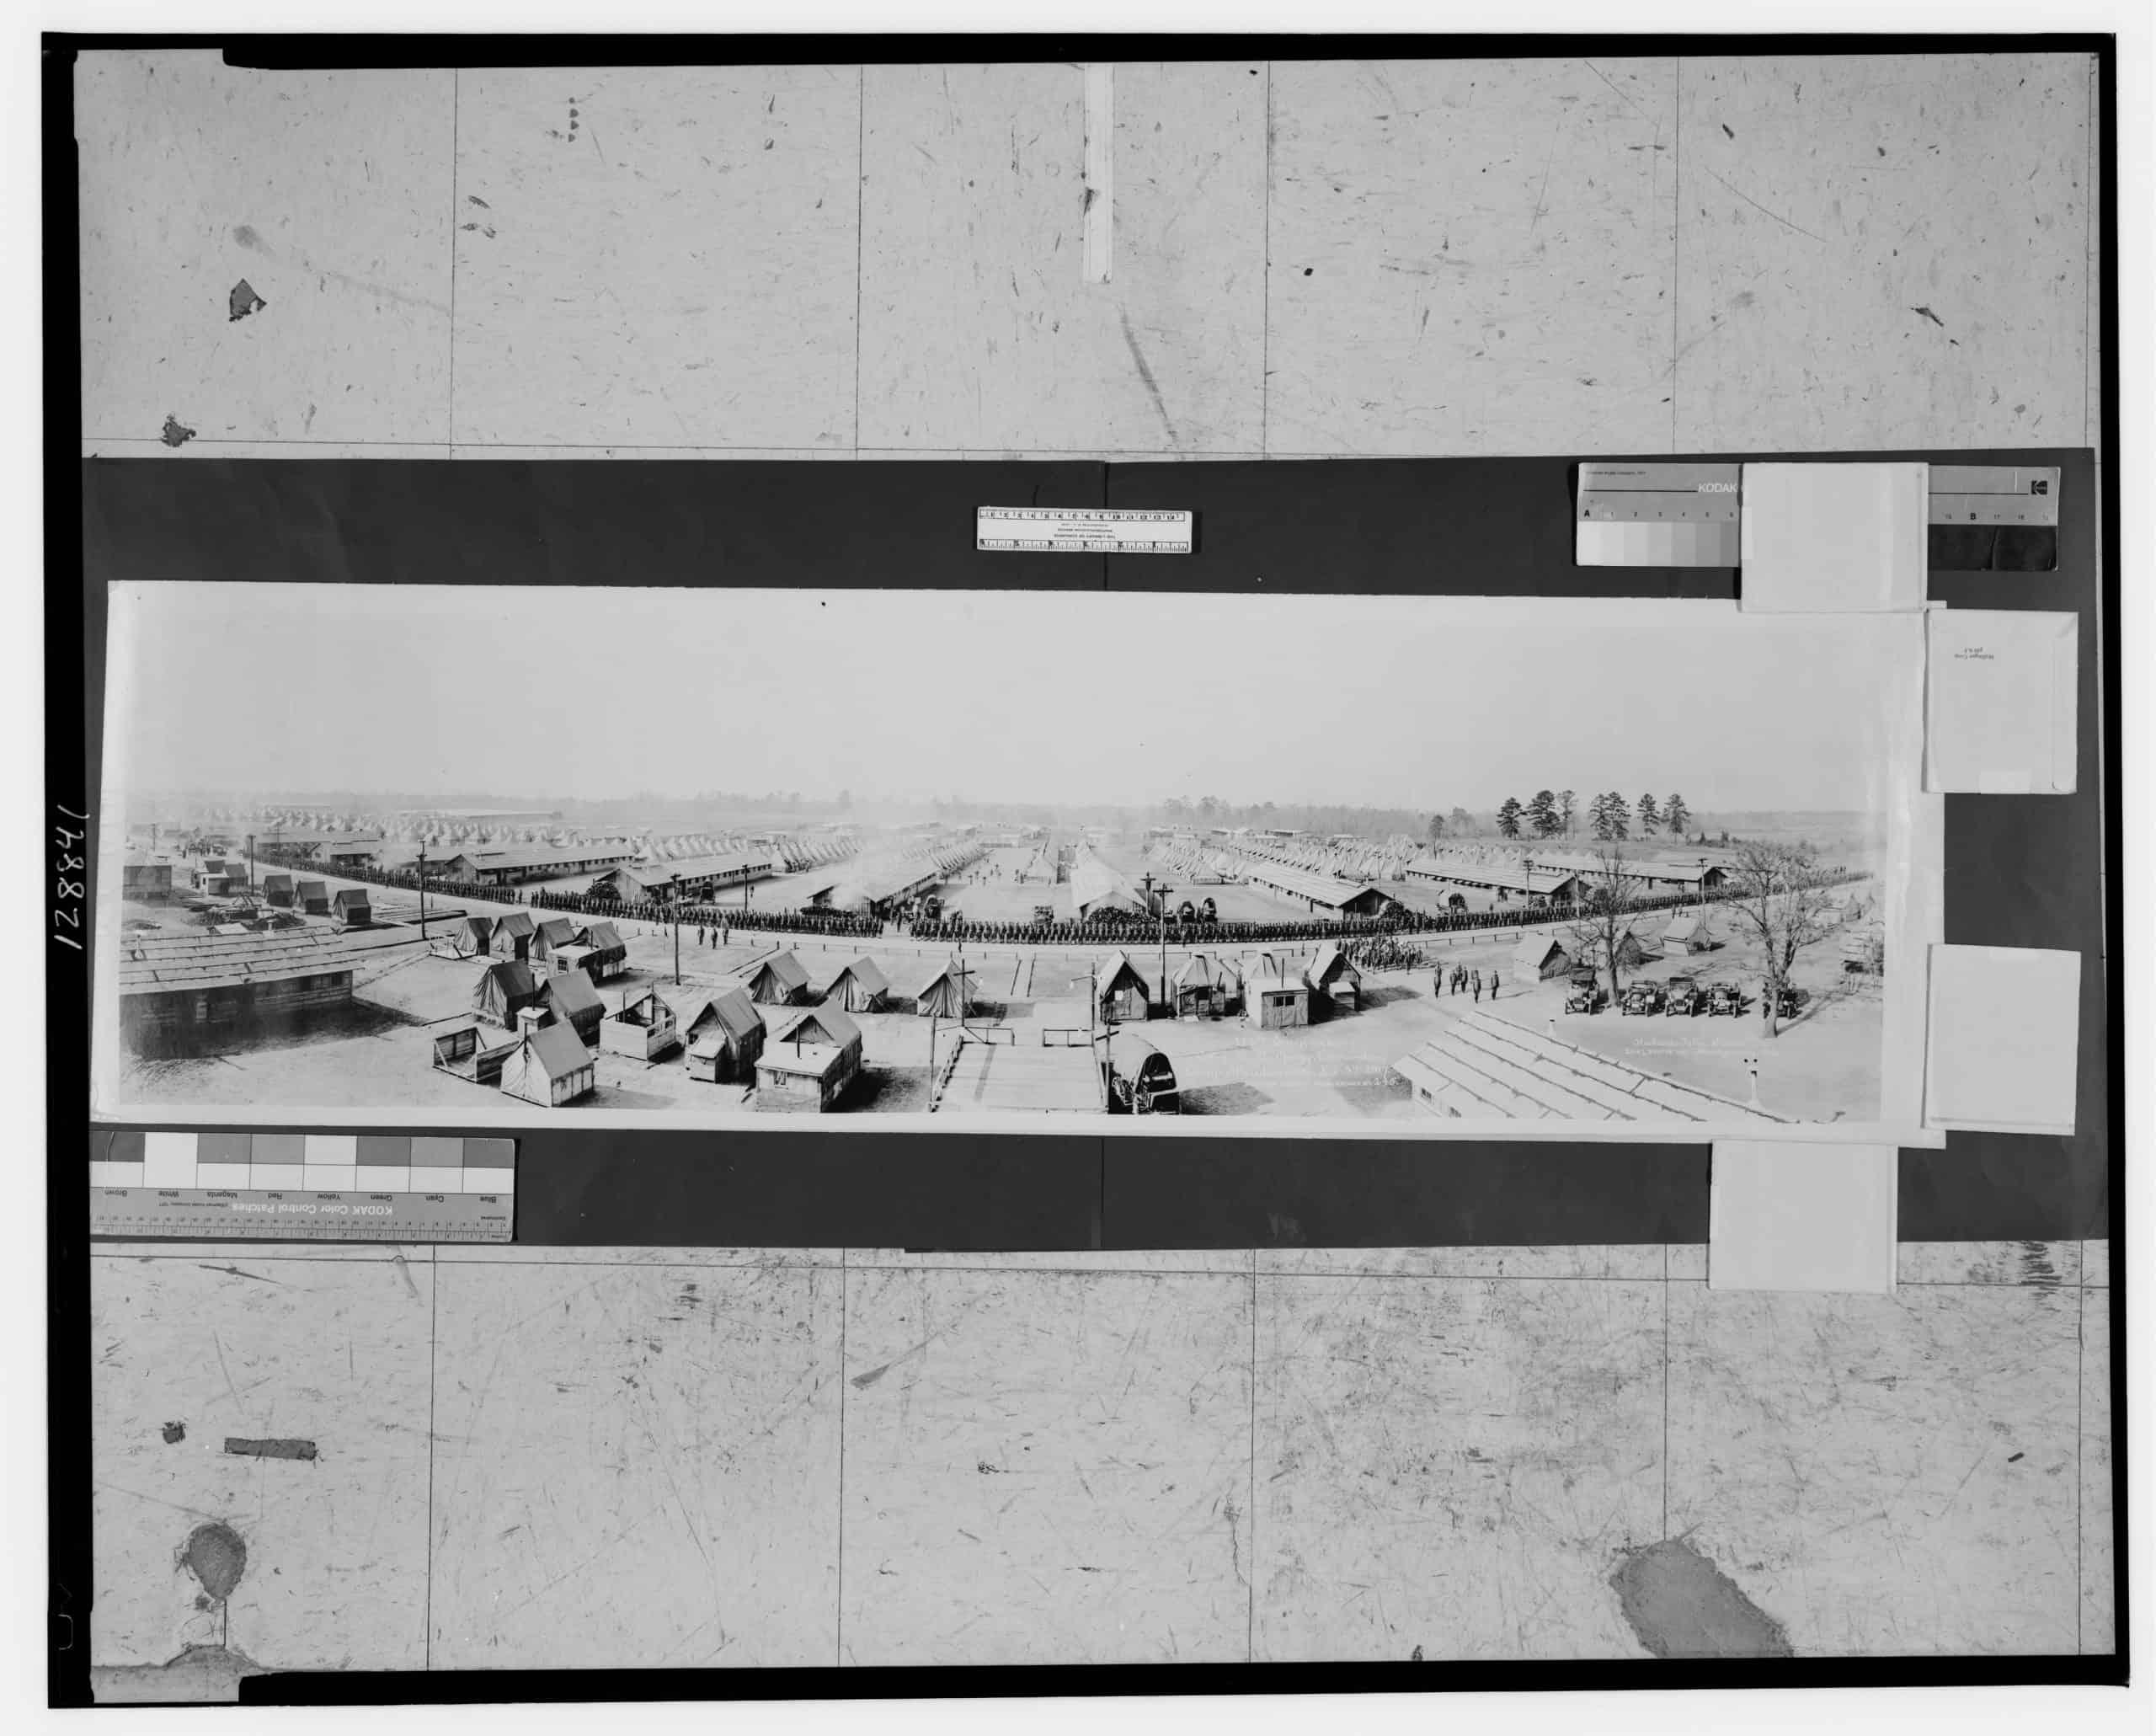 112th Engineers, Col. J. R. McGuigg, commanding, Camp Sheridan, Ala., Richards Film Service,1917